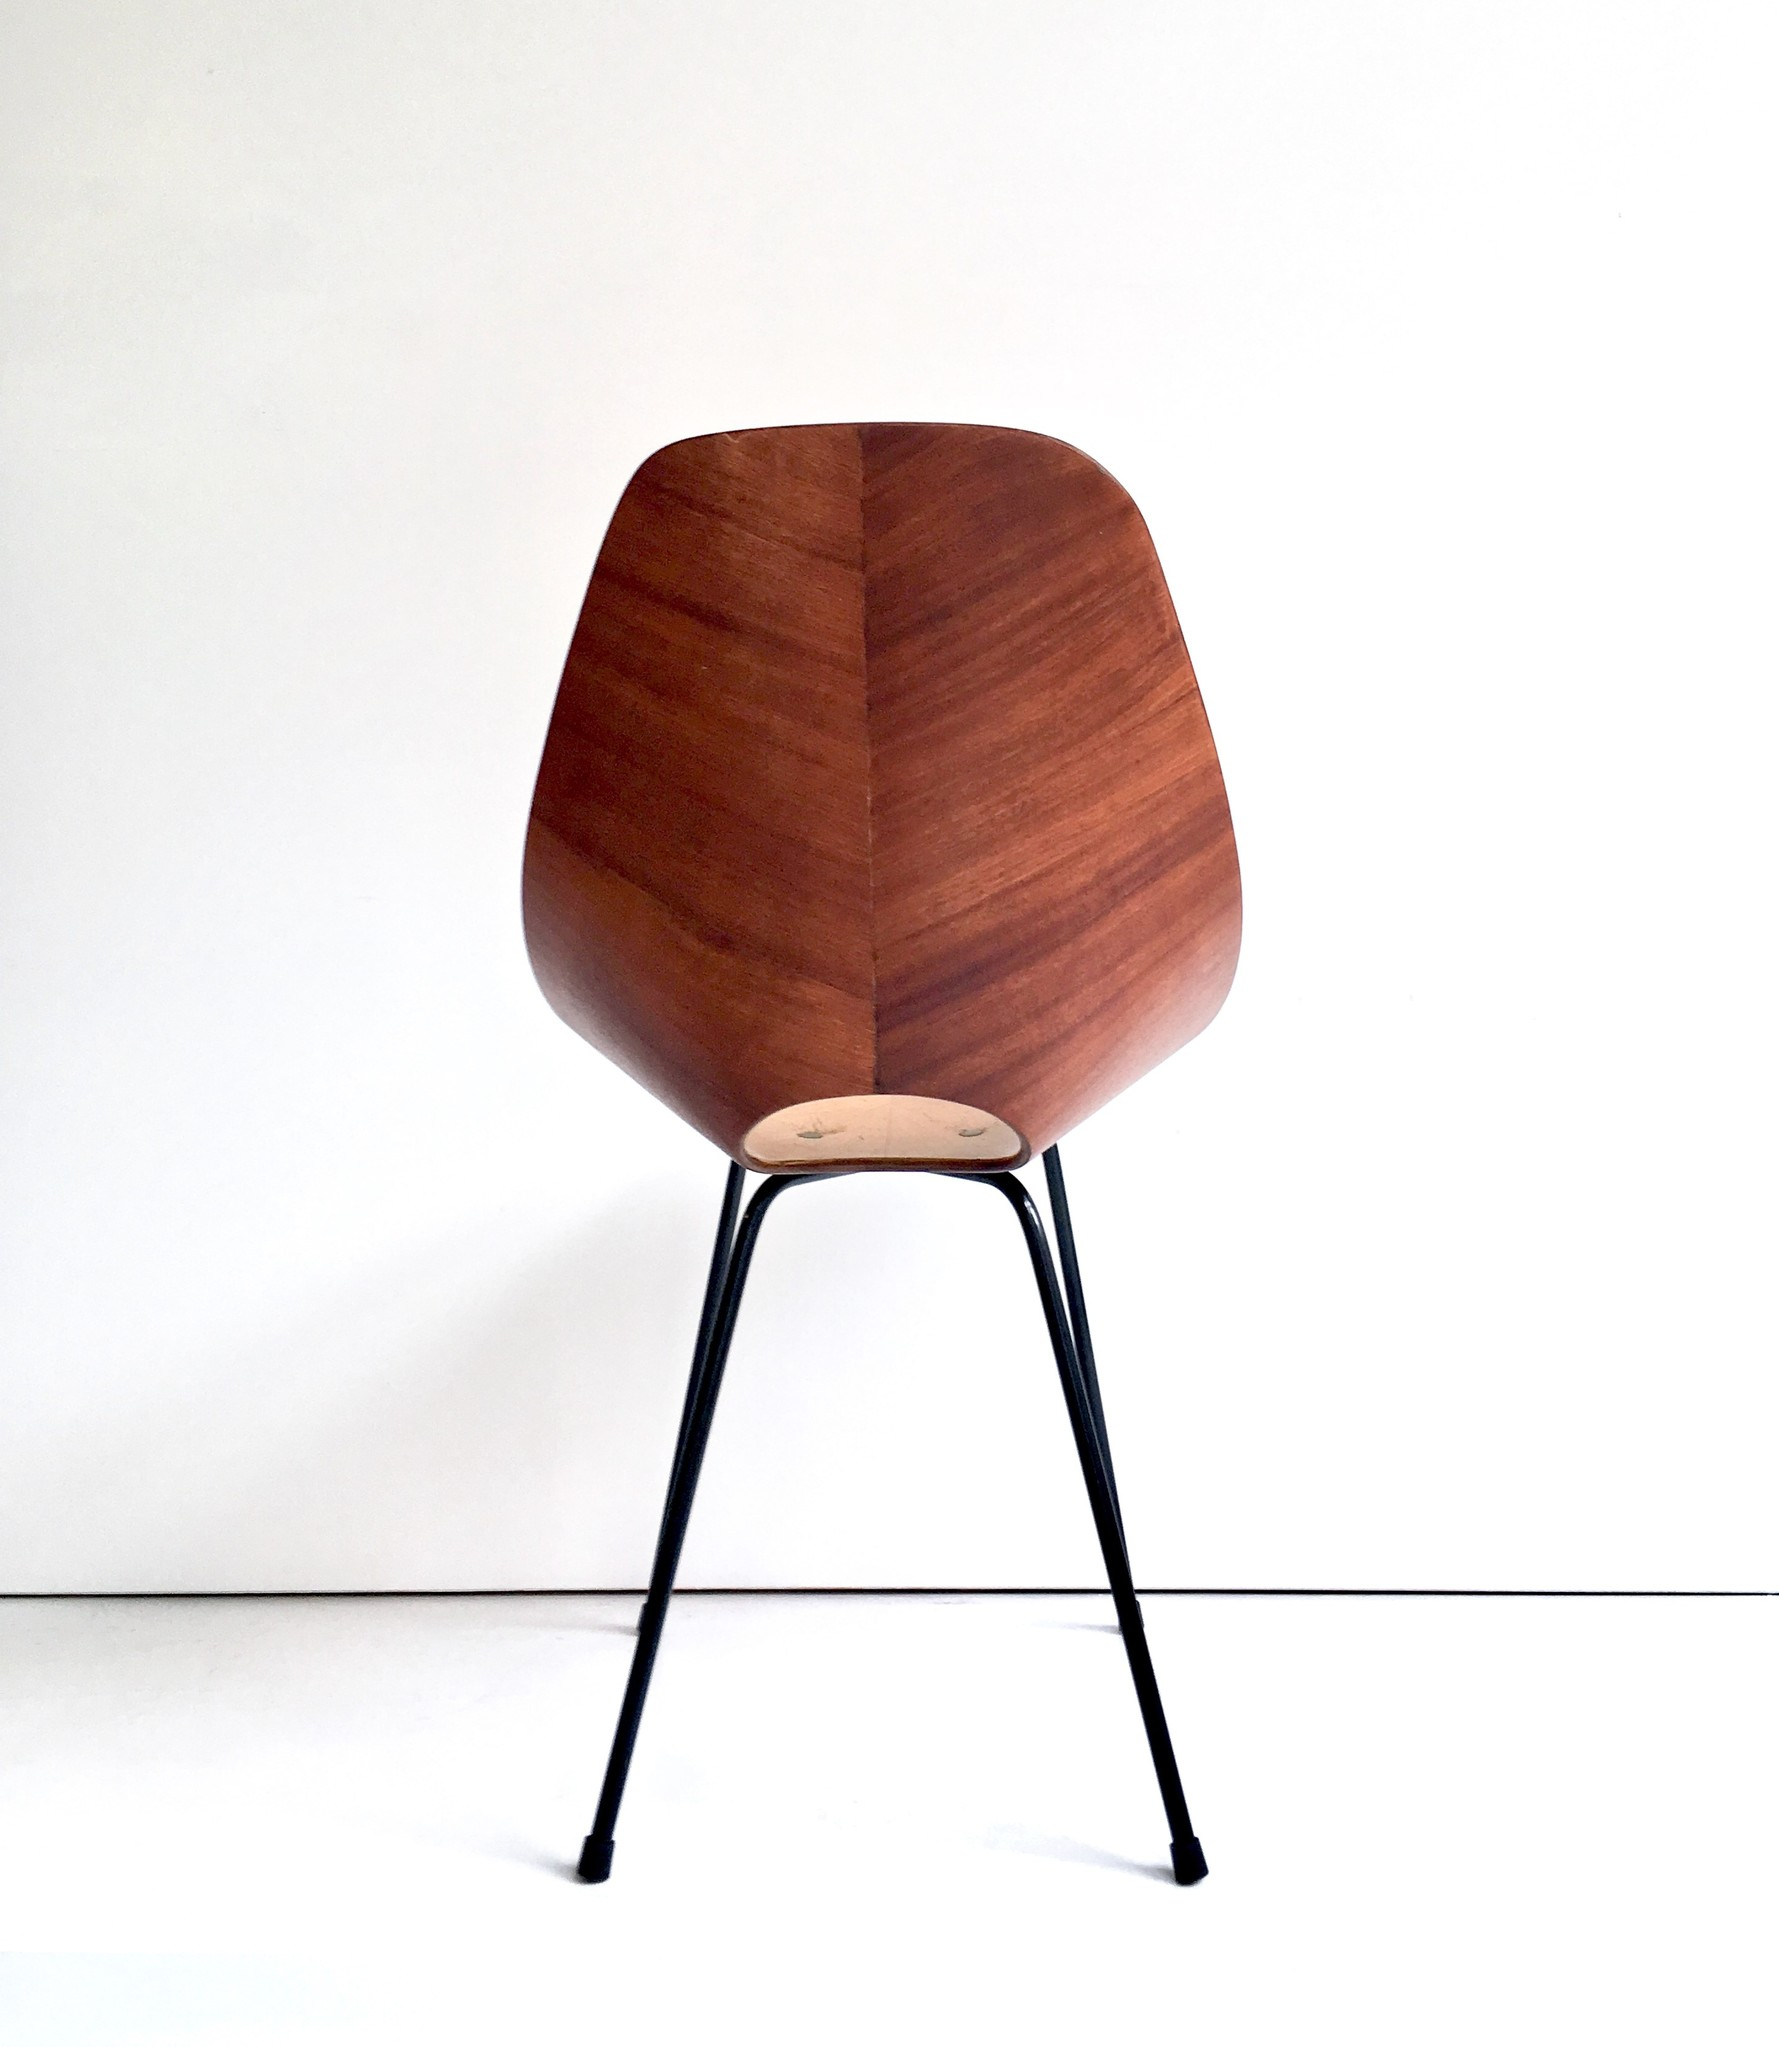 Medea side chair by Vittorio Nobili